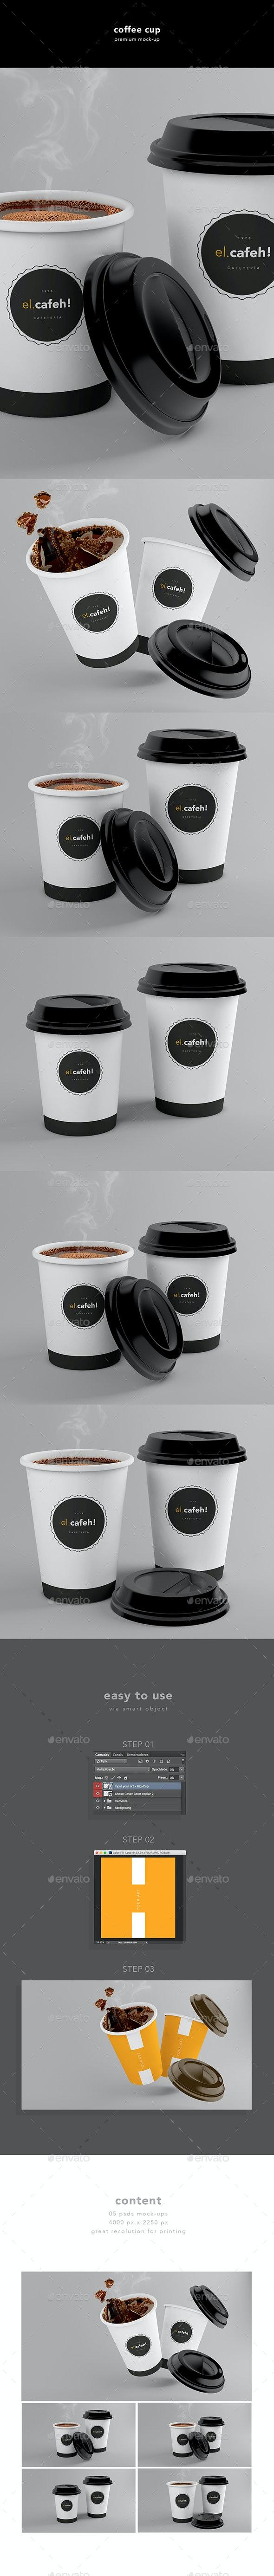 Coffee Cup - Mockup - Food and Drink Packaging